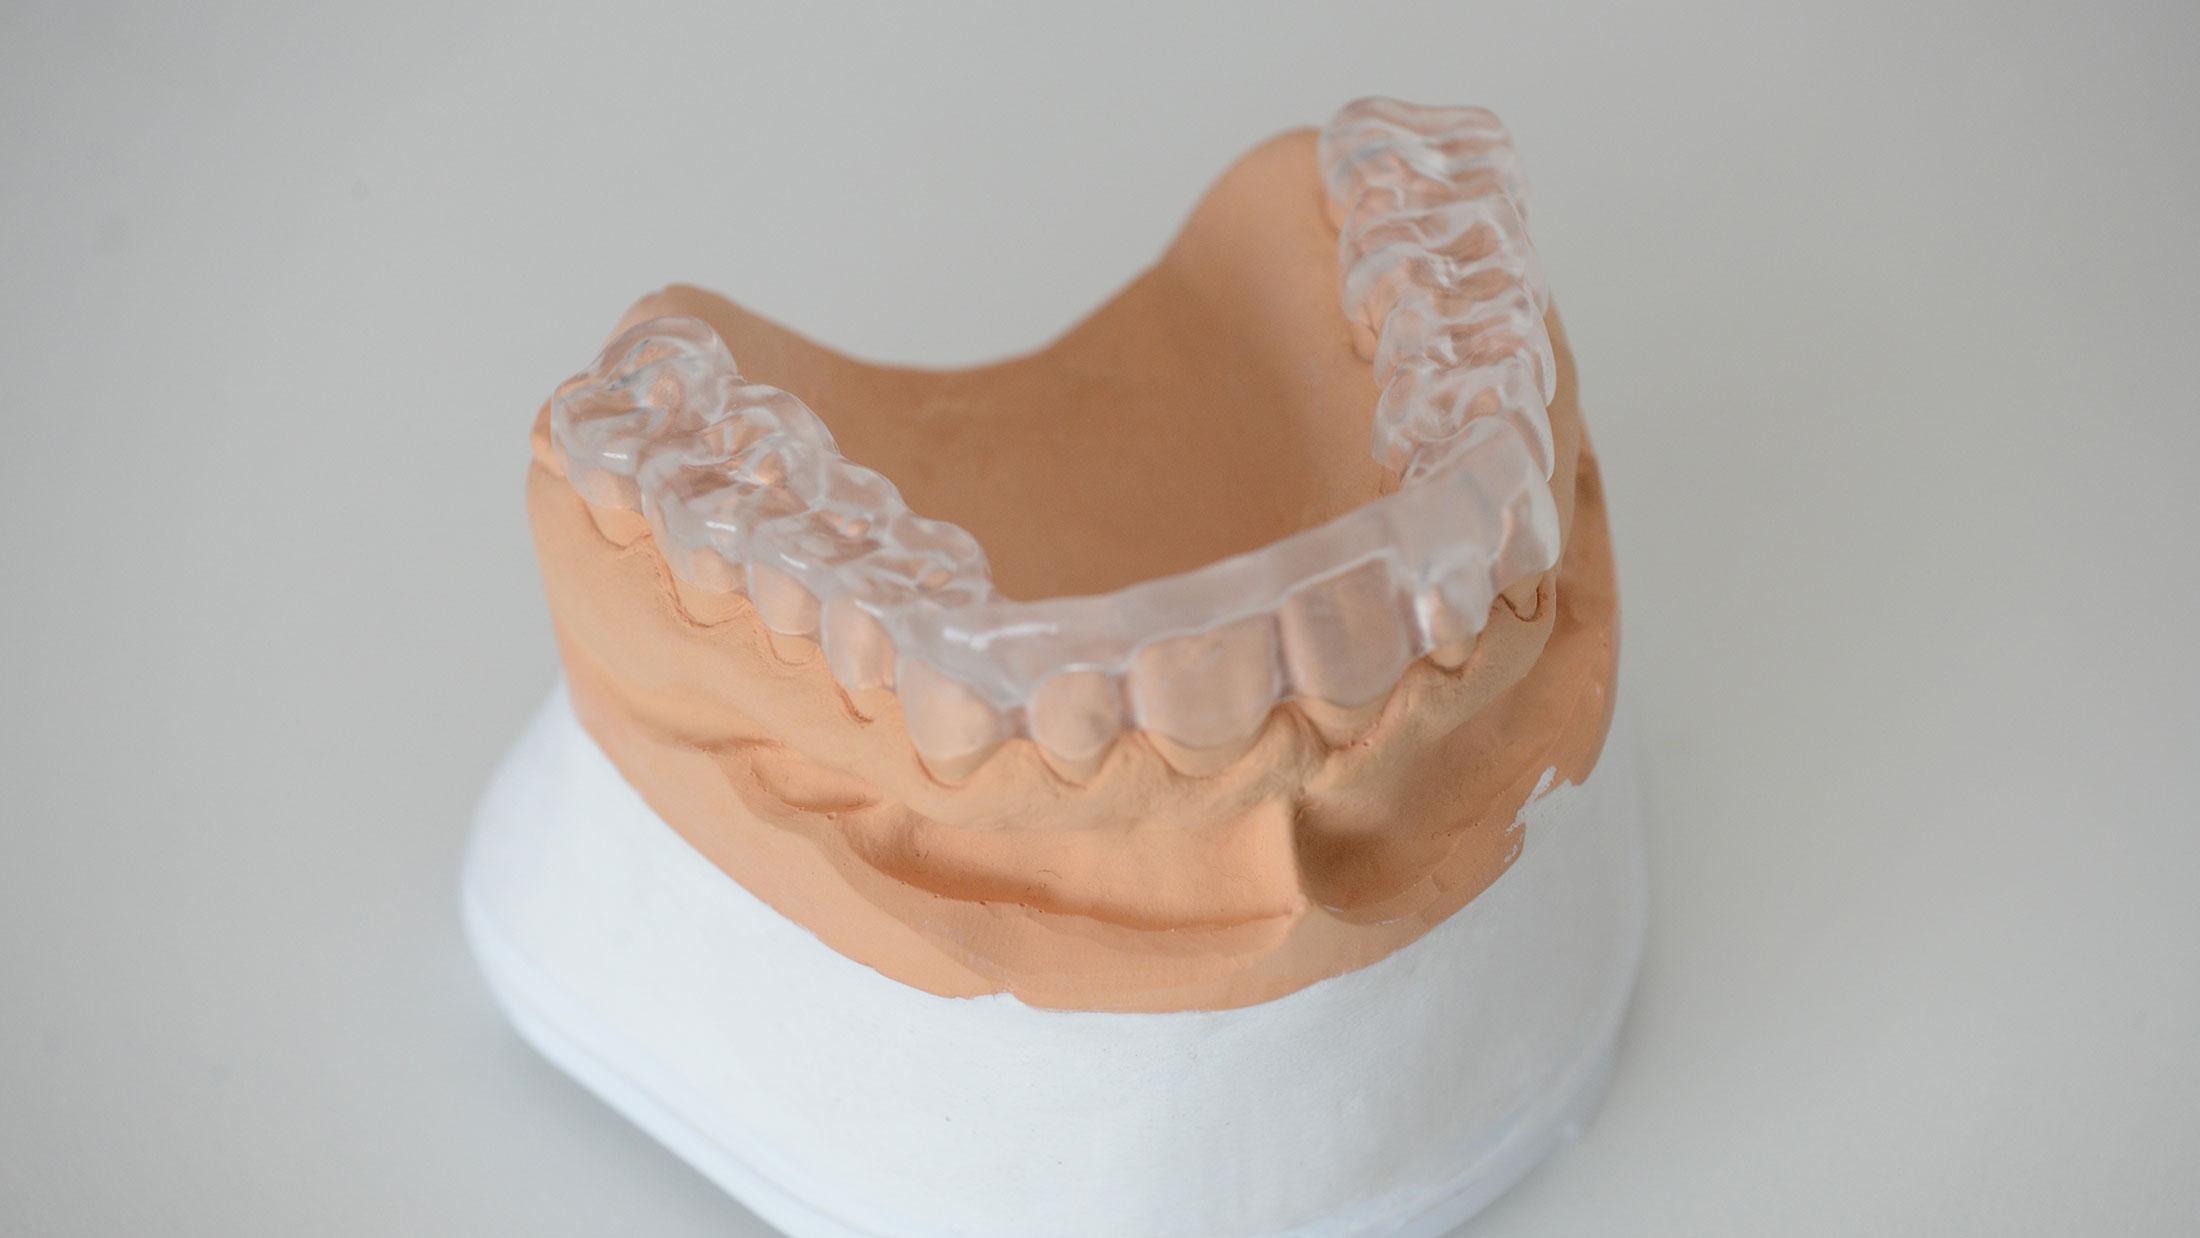 Our Blog | Rotsaert Dental Laboratory Services Inc